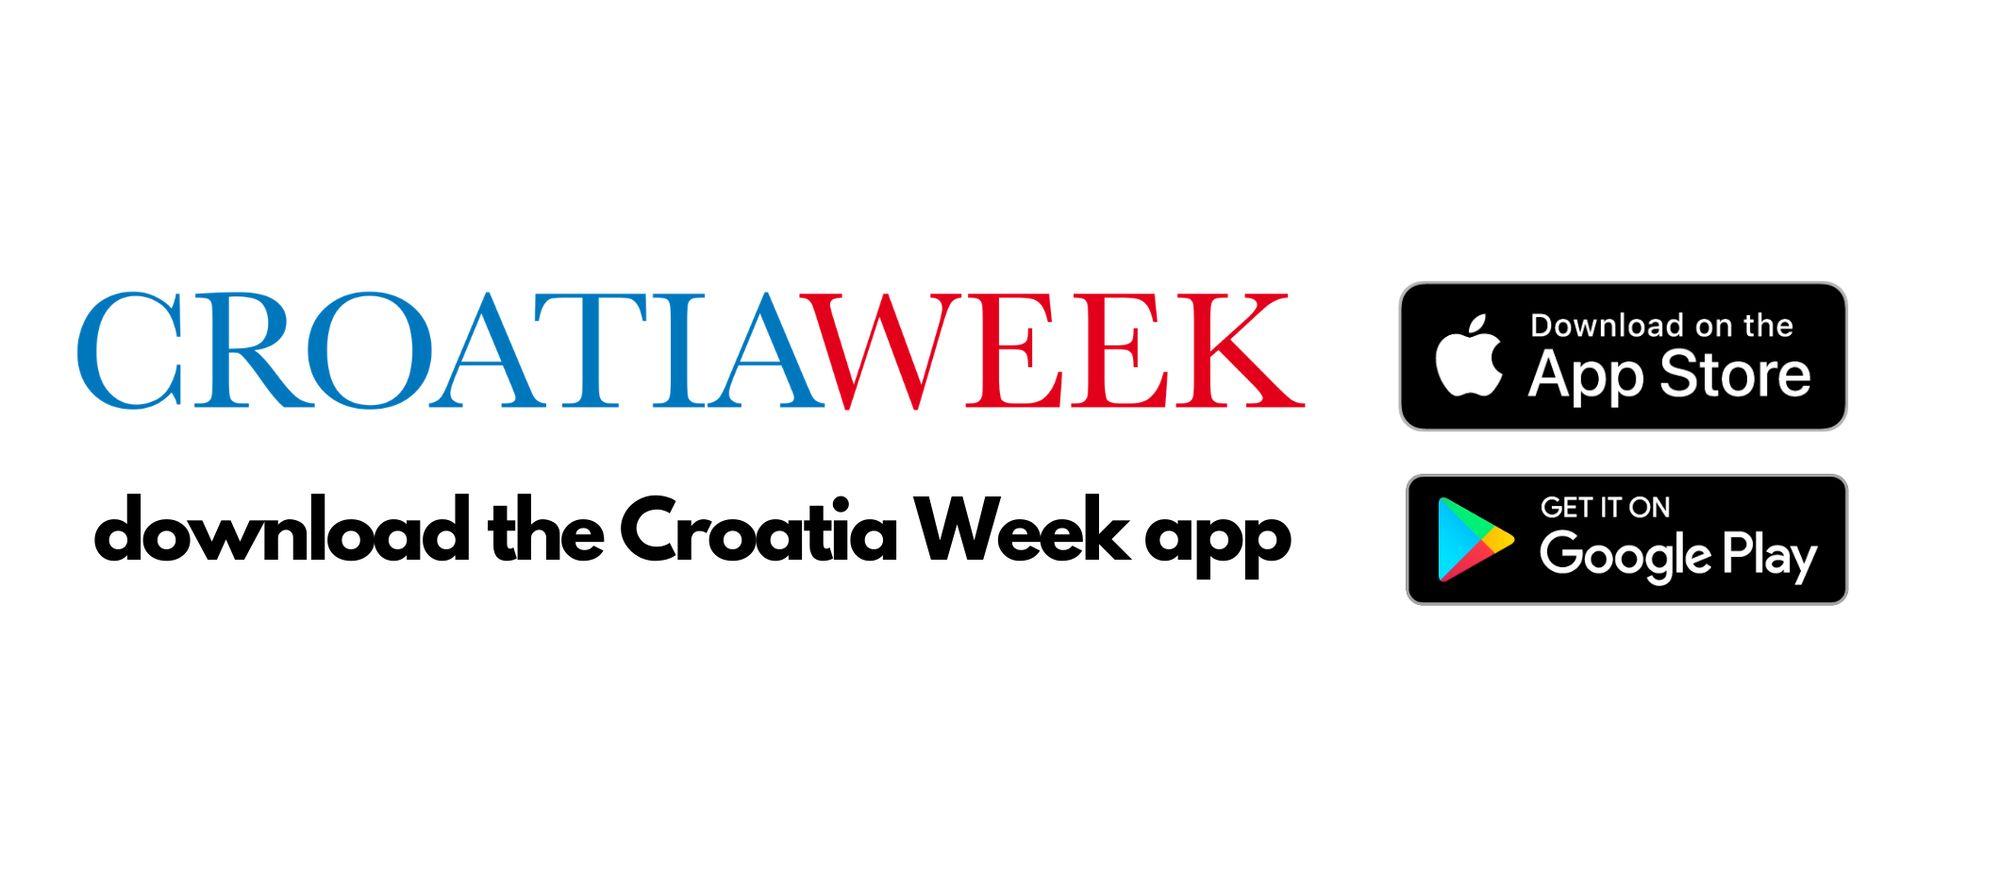 Download the Croatia Week app